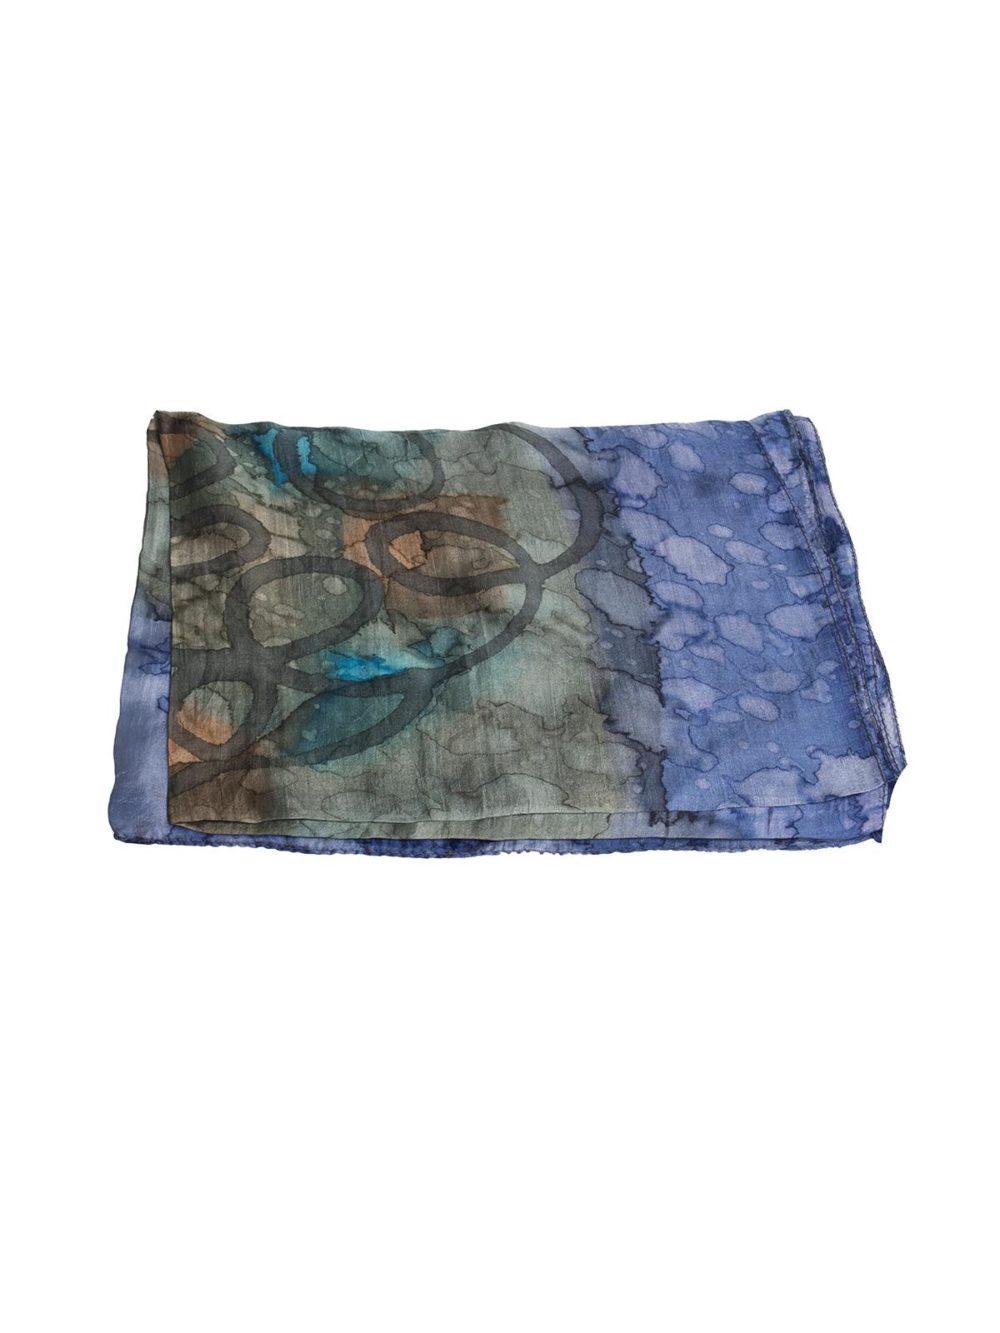 Gogo Single Scarf Blue manicay Katie Kerr Women's Accessories Women's Clothing